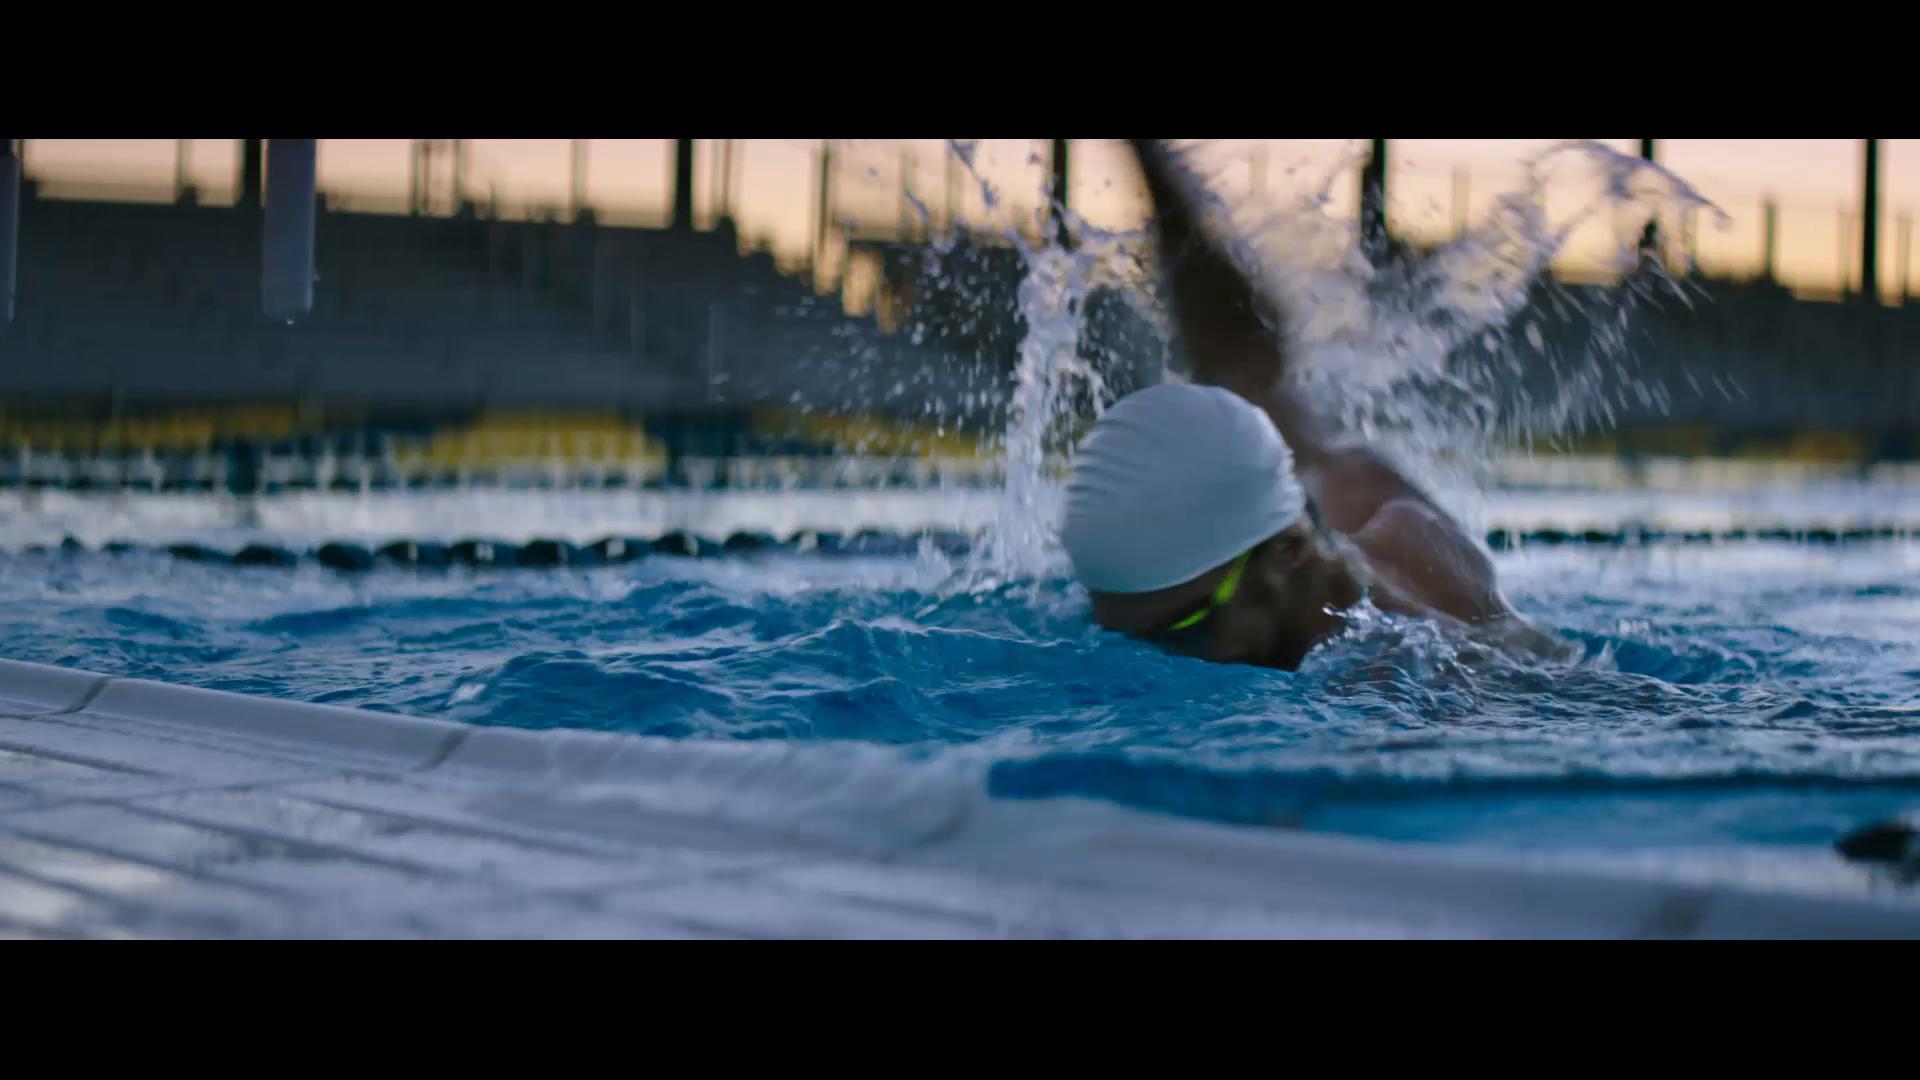 Thumbnail for Michael Phelps